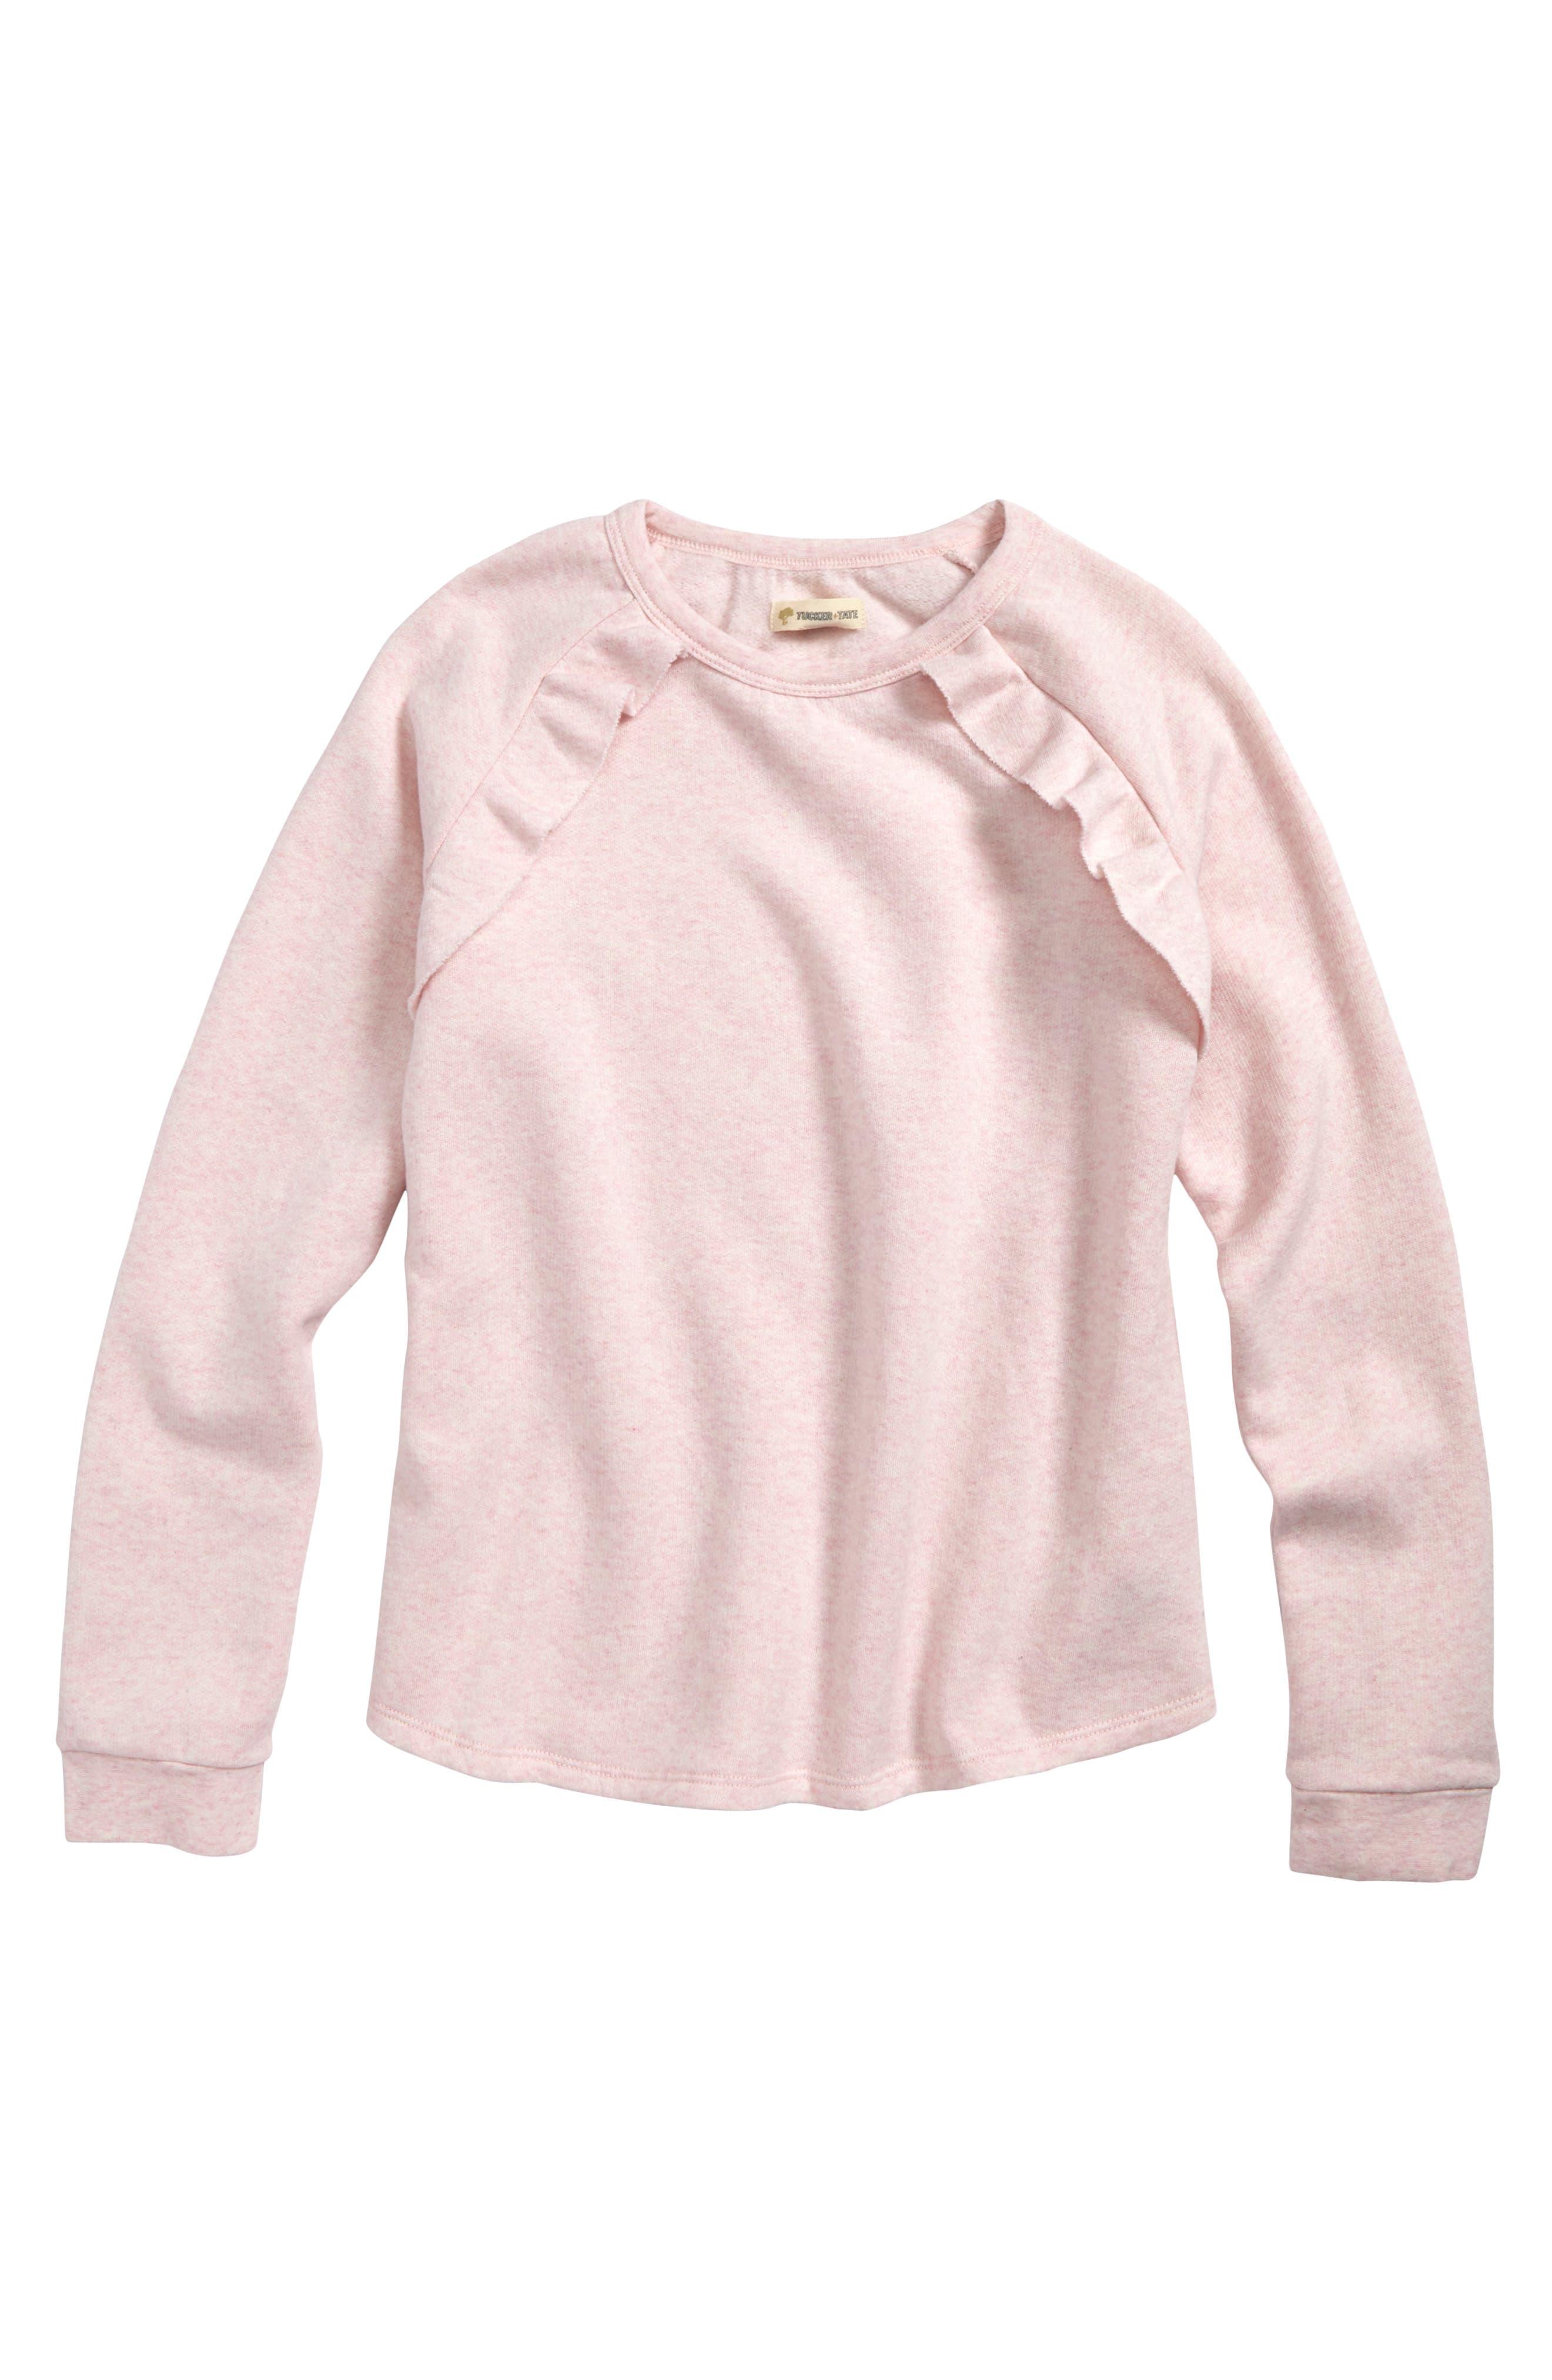 Ruffle Fleece Sweatshirt,                         Main,                         color, PINK BREATH HEATHER